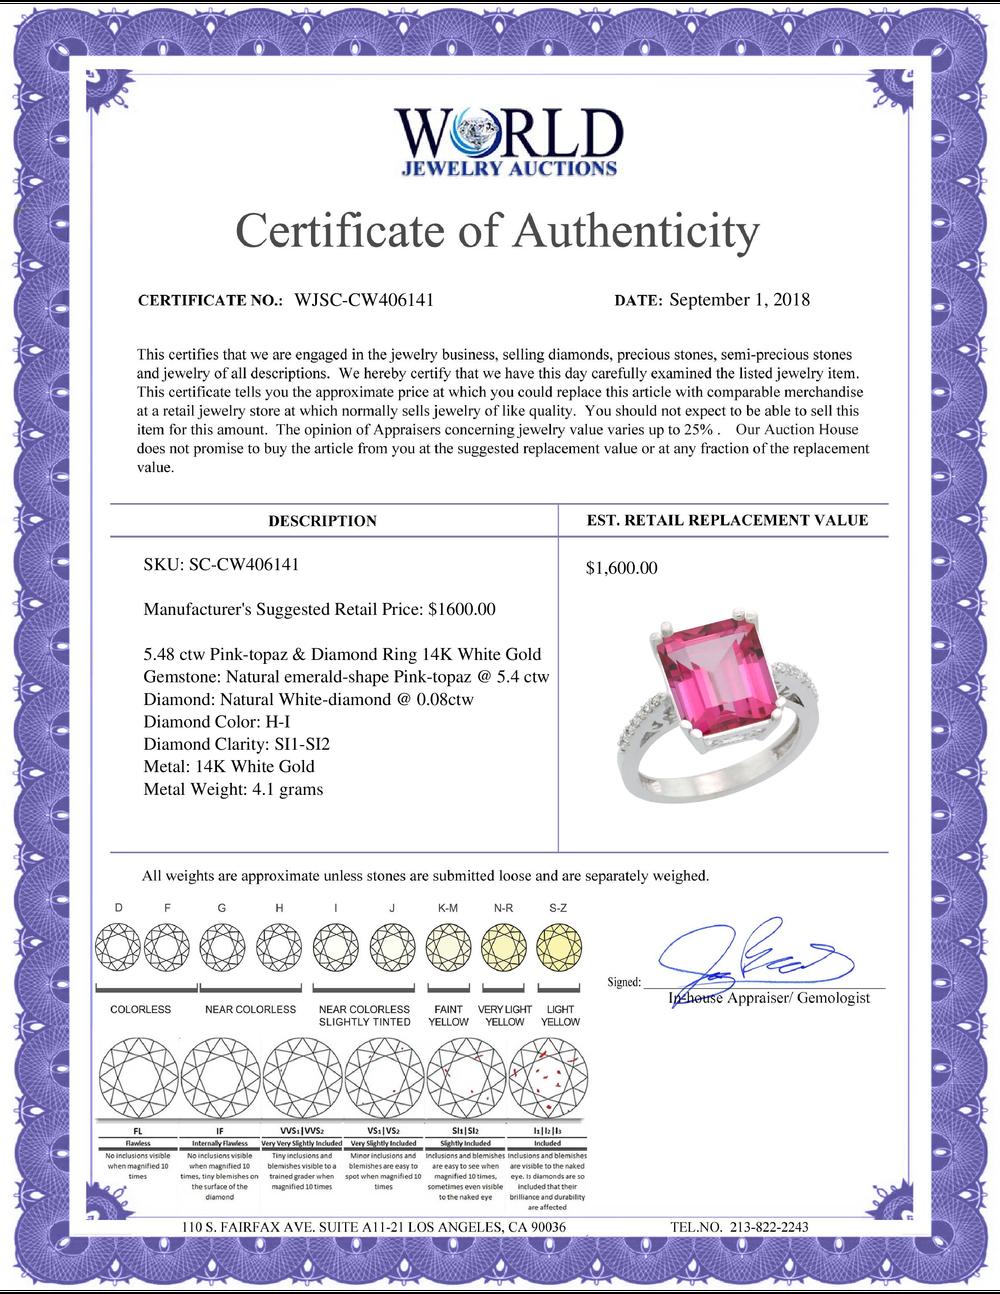 Lot 3069: Natural 5.48 ctw Pink-topaz & Diamond Engagement Ring 14K White Gold - REF-51A4V